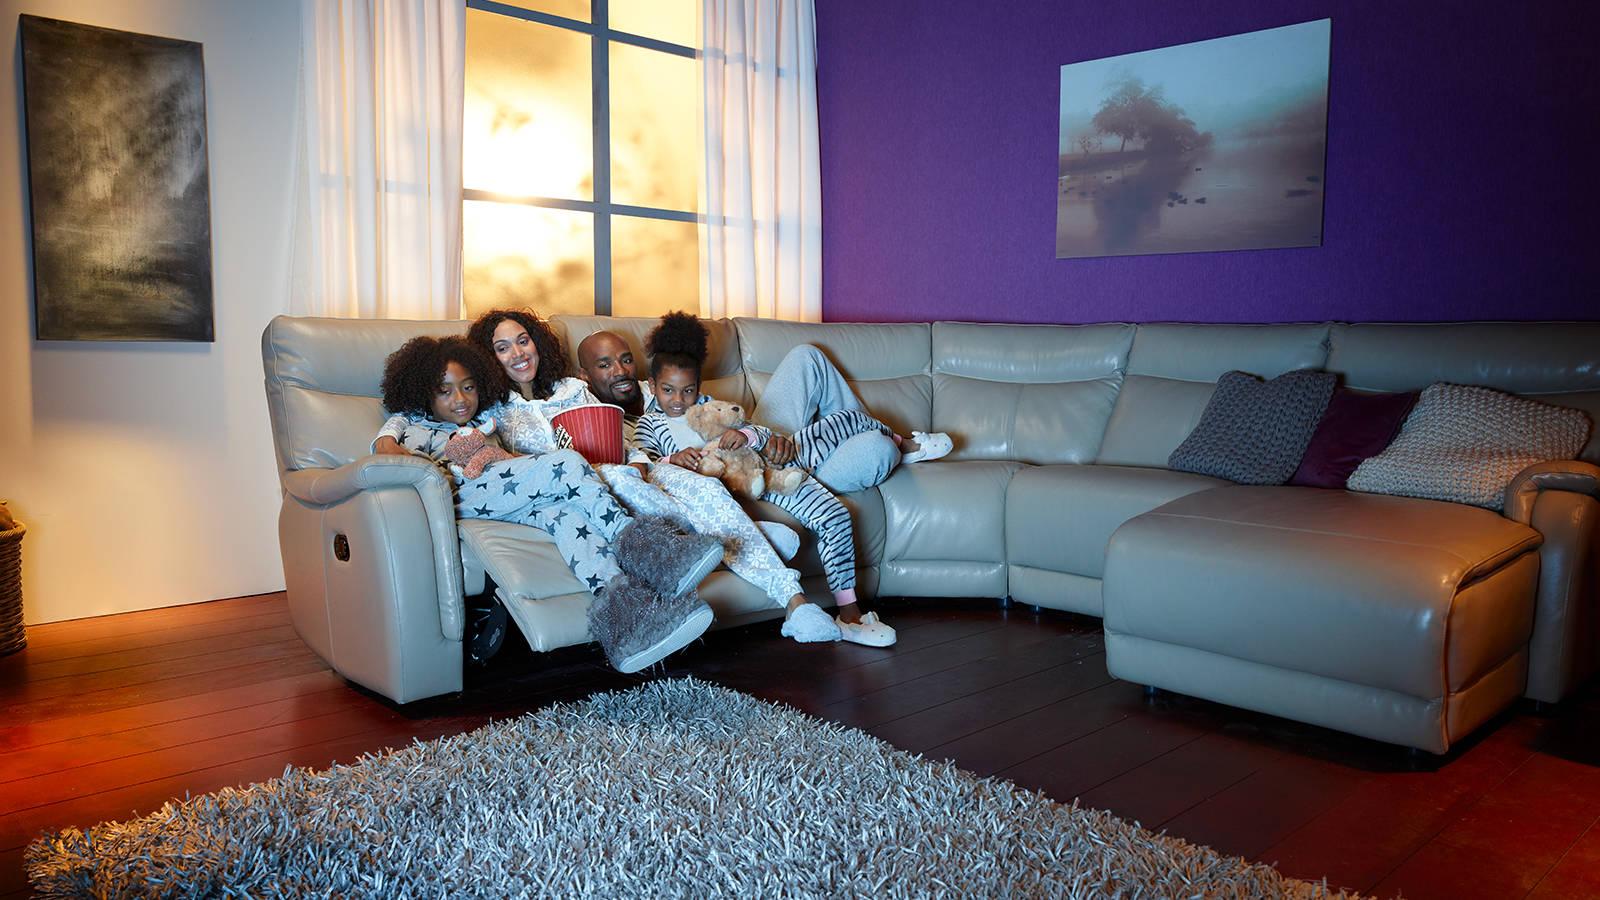 Family huddled on a white leather corner recliner sofa